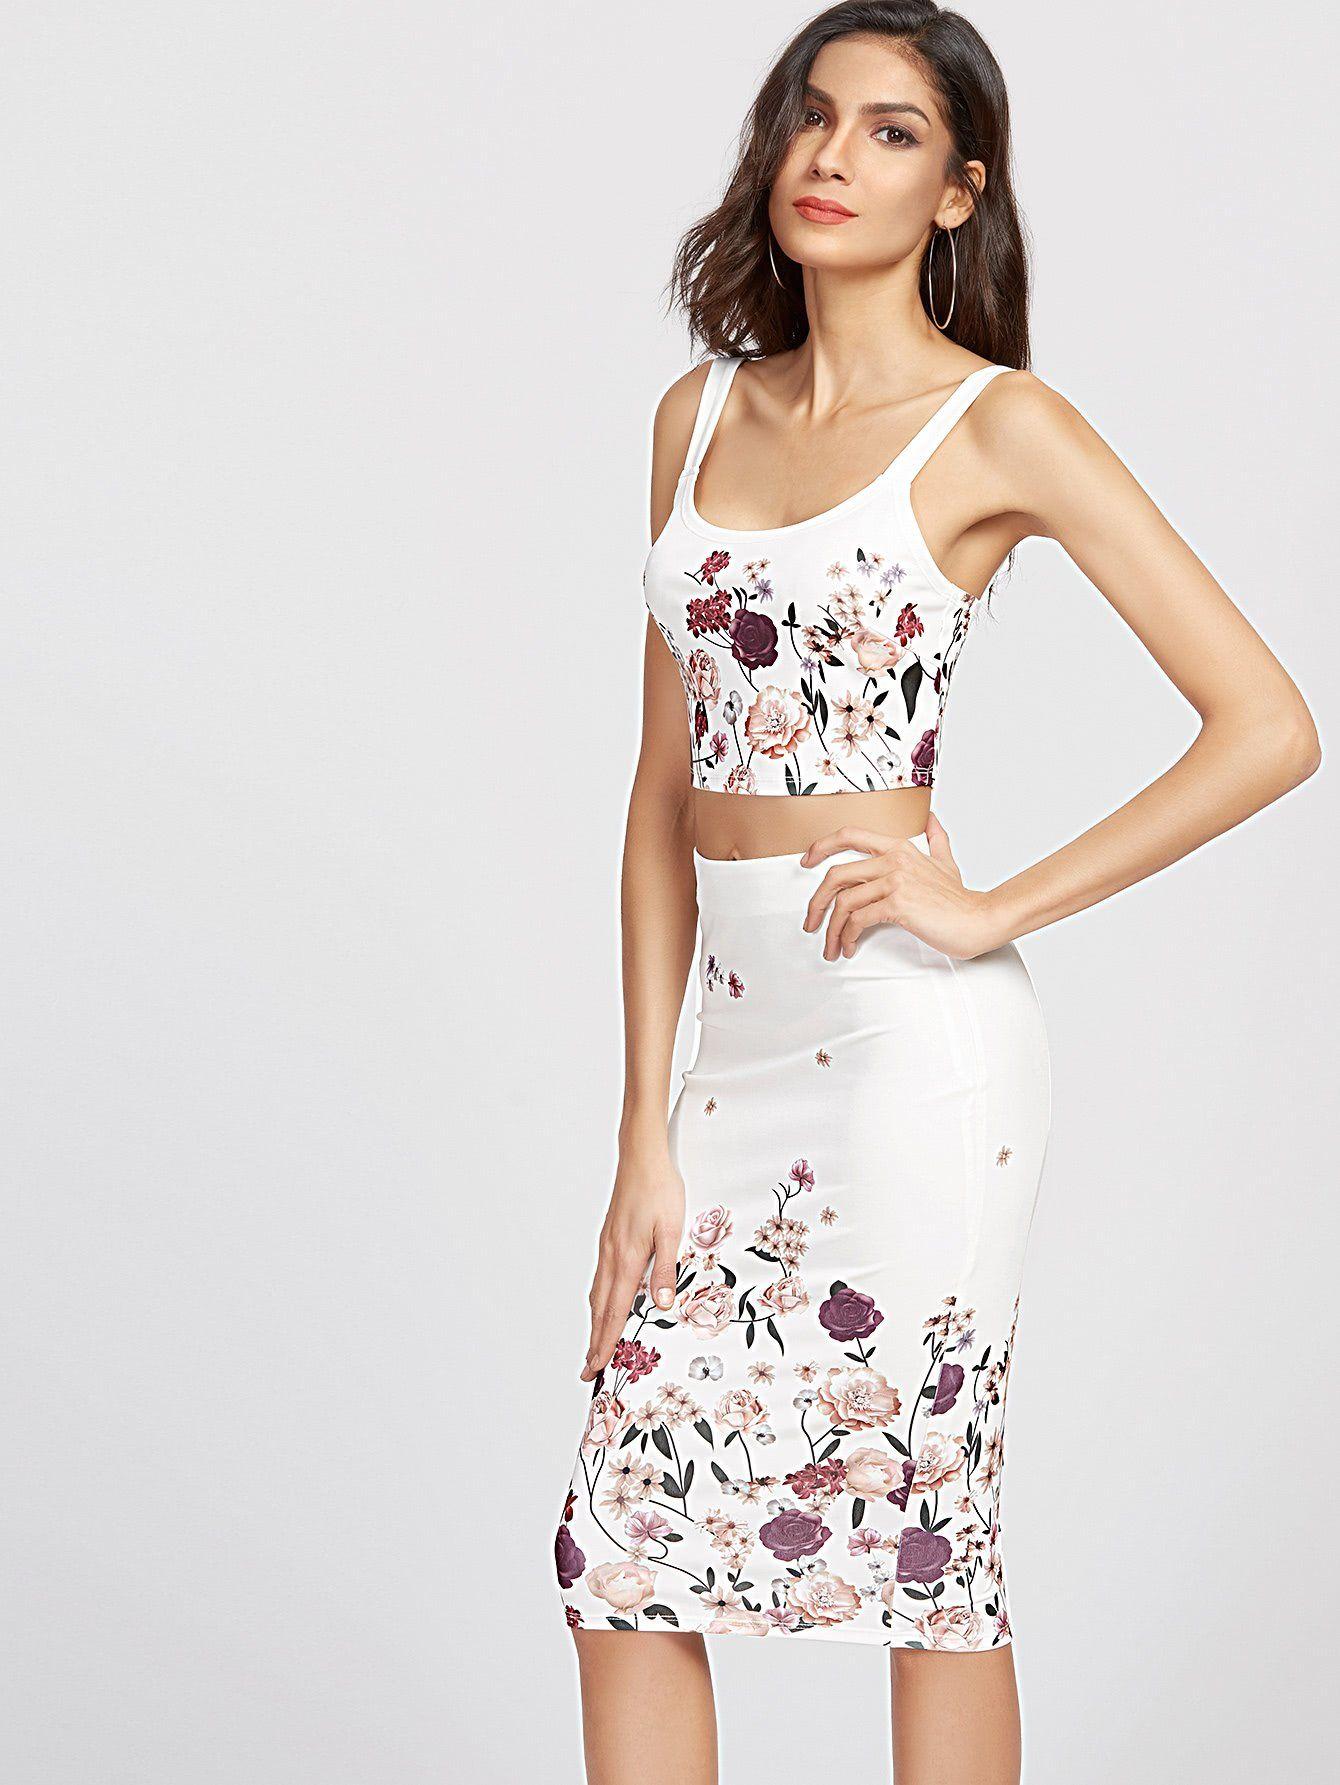 Pencil Skirt And Crop Top Set Denim Bralet U Zip Front Eozy Luxury Women Sleeveless Lace Long Maxi Dress European Style Flower Print Tank With